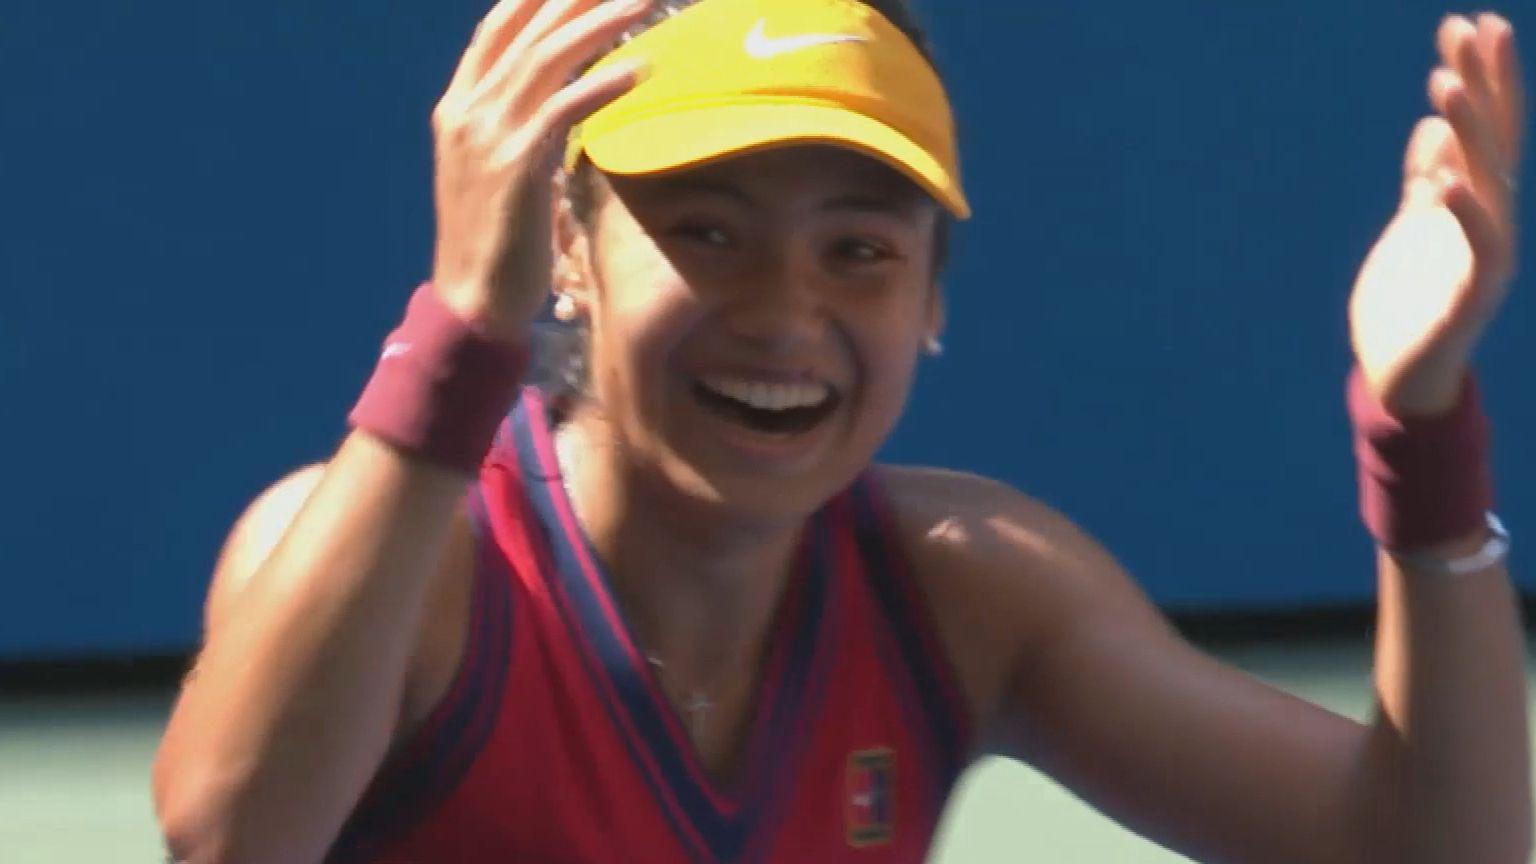 British teen Emma Raducanu upsets Belinda Bencic in US Open 'madness'